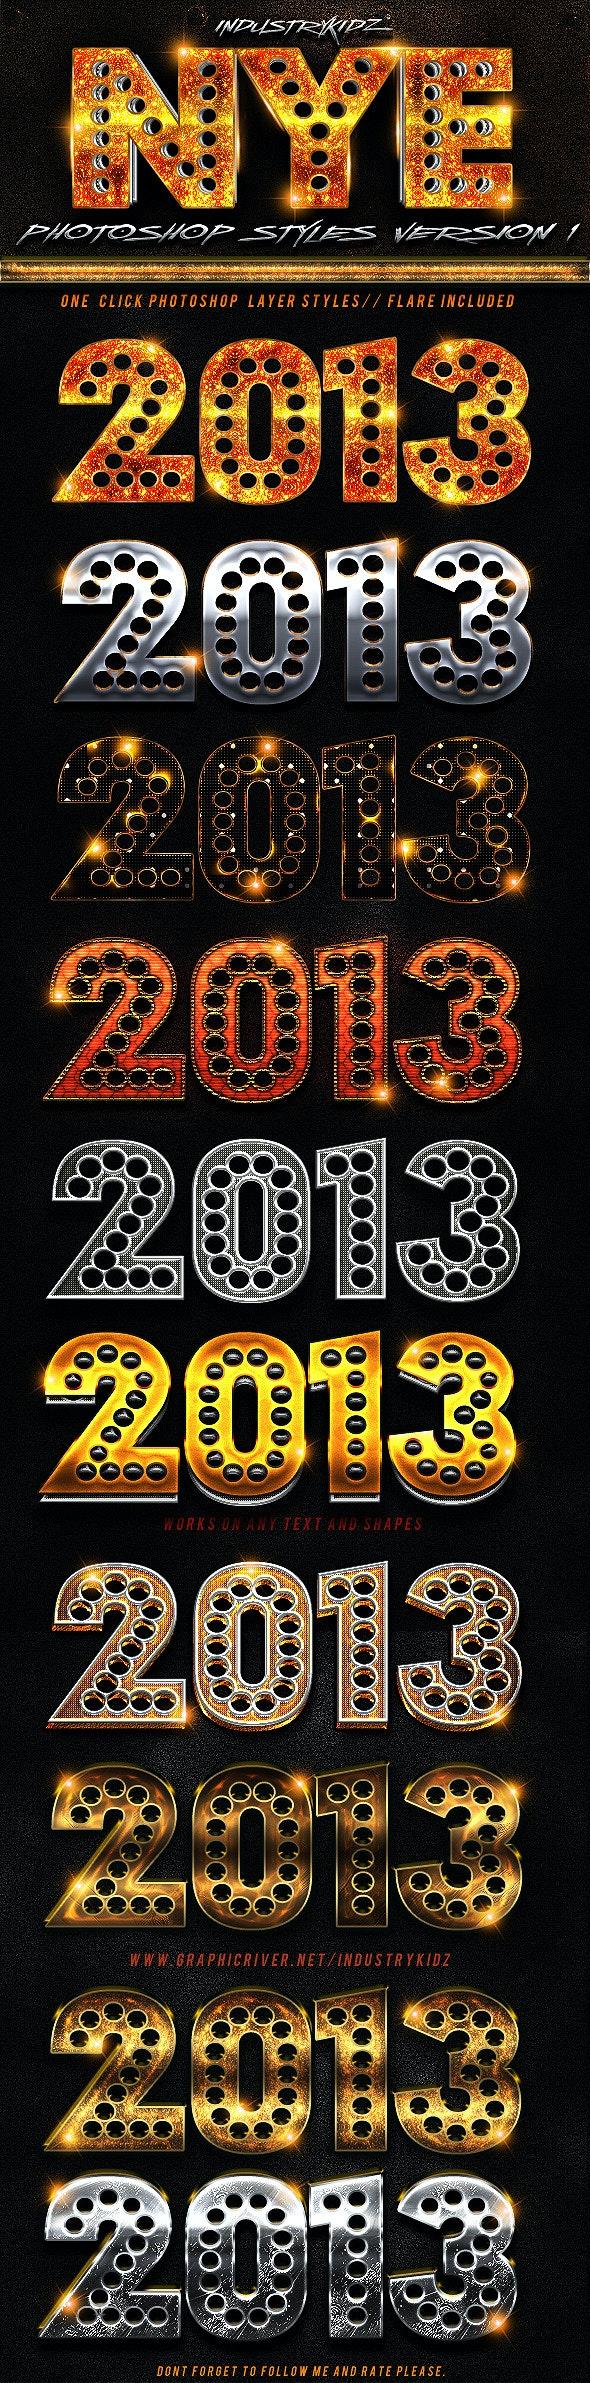 New Year Photoshop Styles  - Styles Photoshop